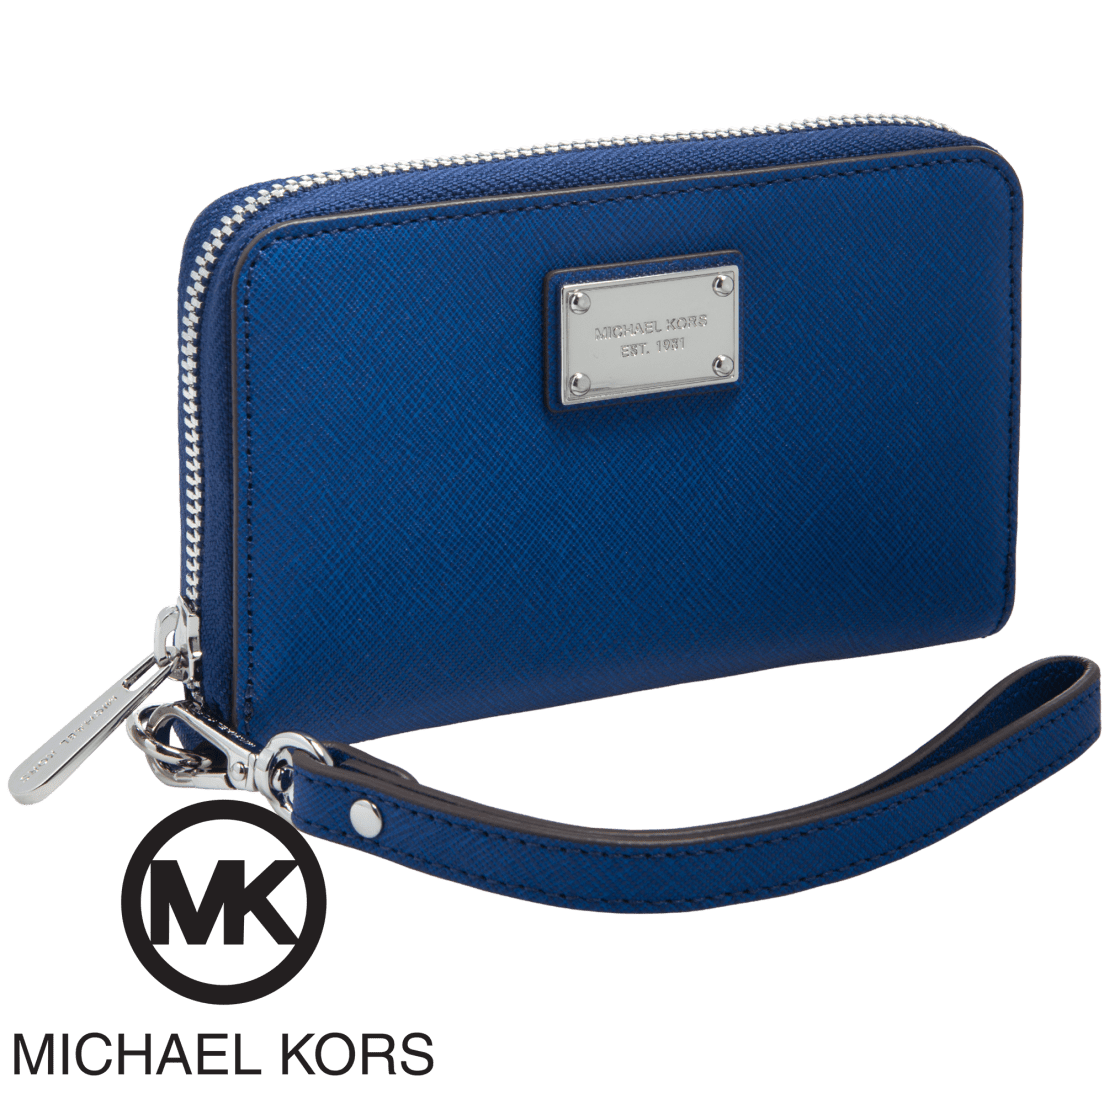 b345dee5a3d7 Small Essential Zip Wallets by Michael Kors